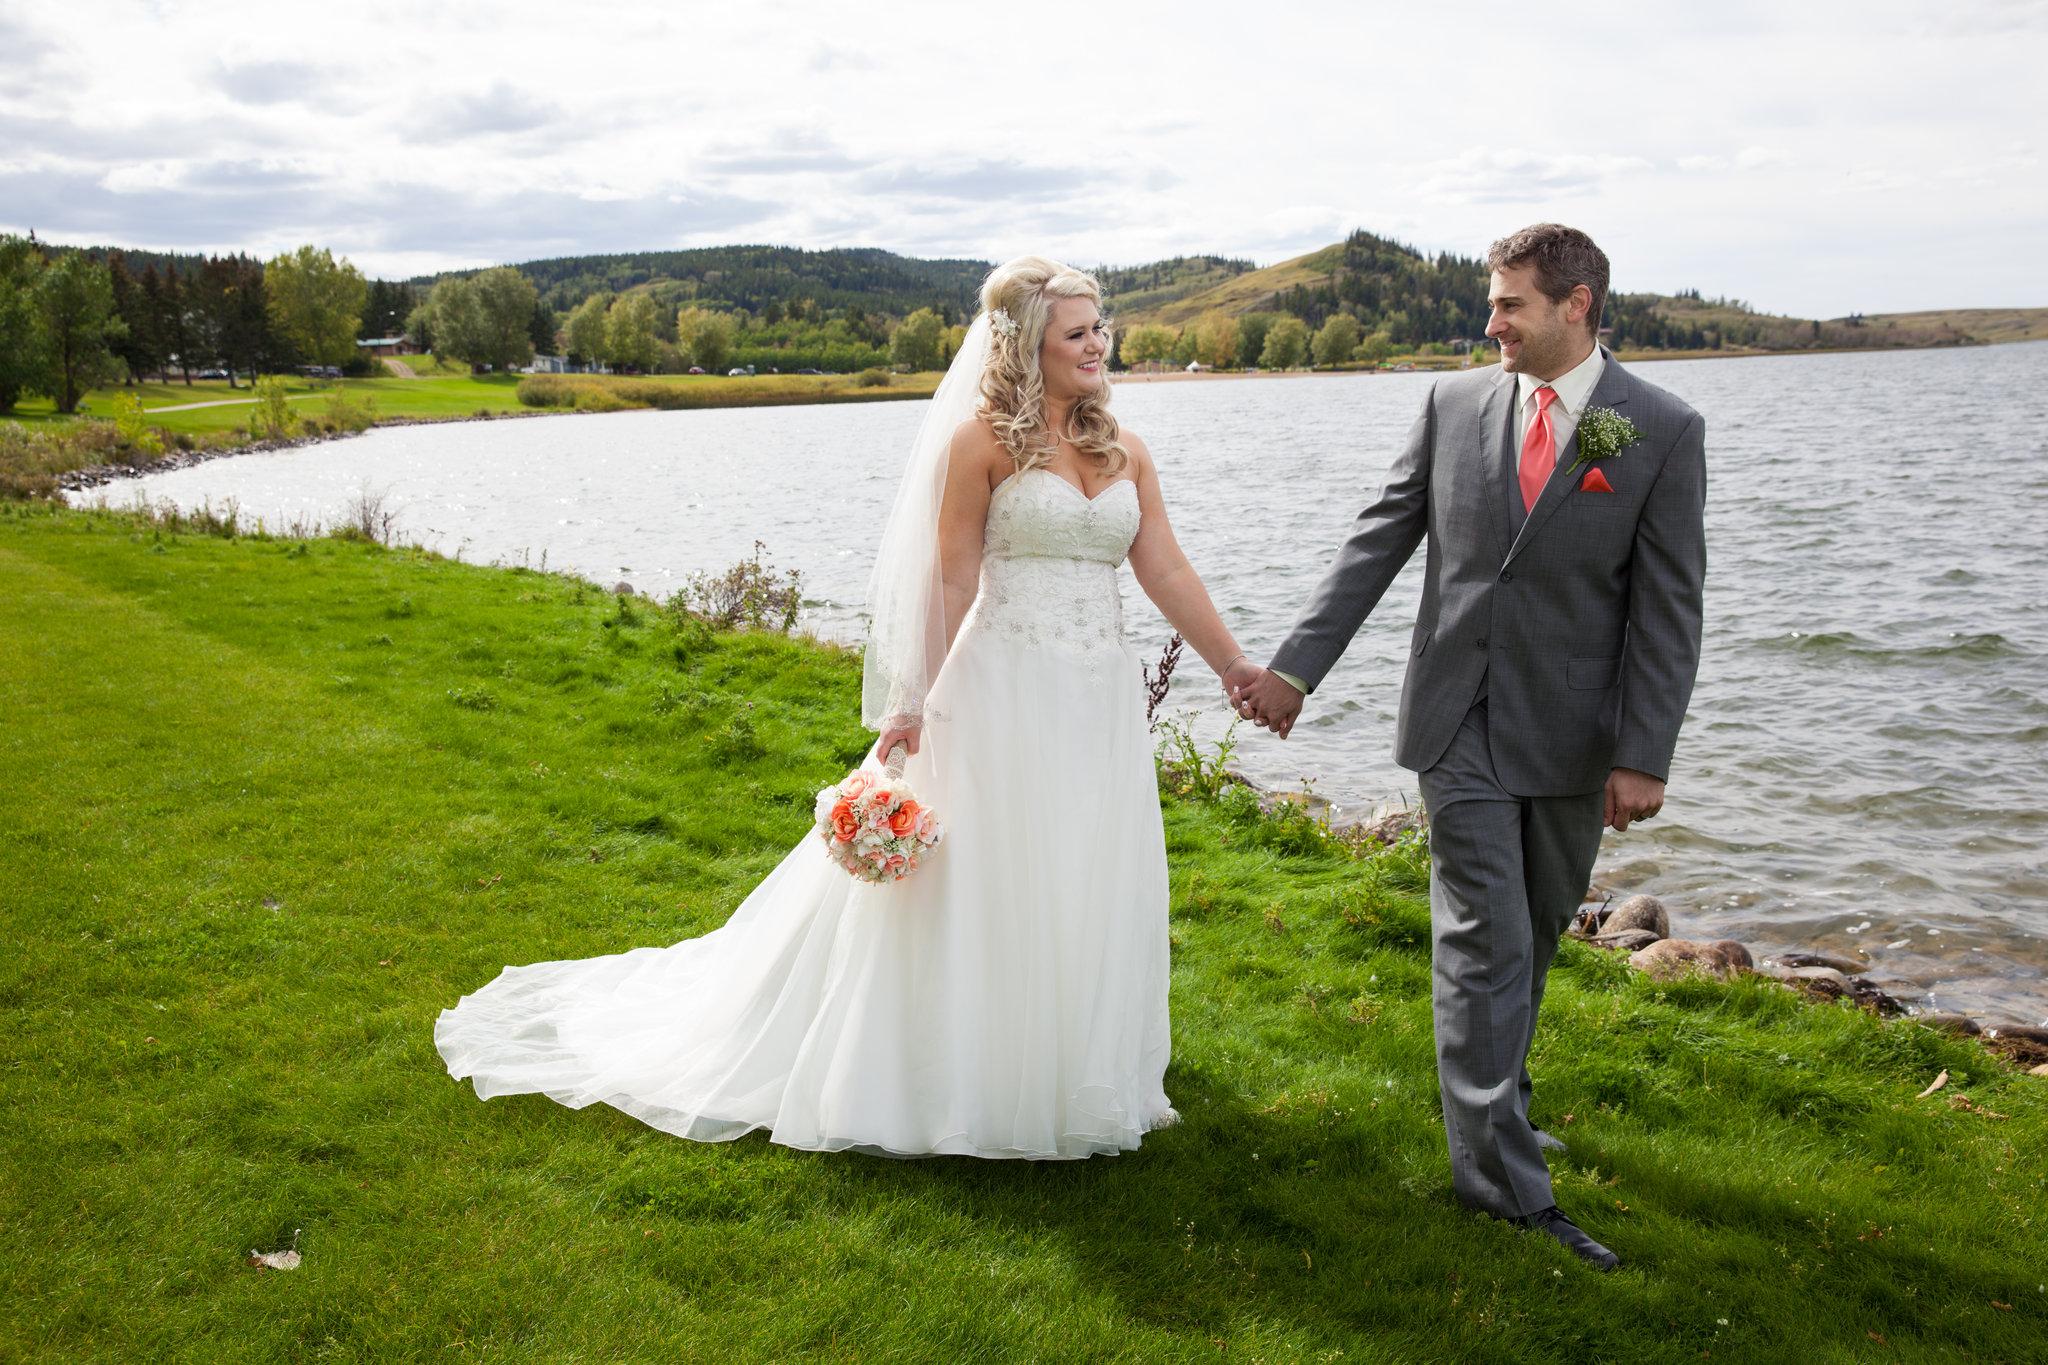 Cypress Hills Wedding Photography, Elkwater Wedding Photography, Medicine Hat Wedding Photography, Elkwater Wedding Photographer, Cypress Hills Wedding Photographer